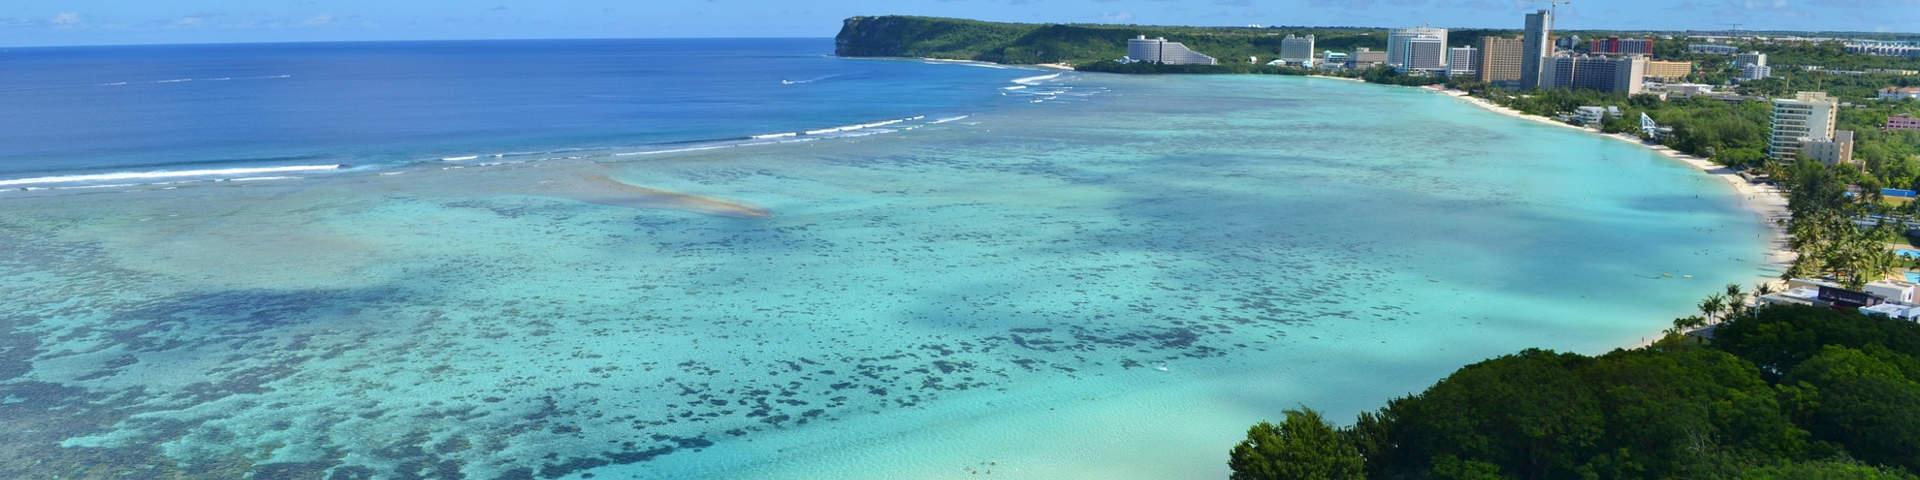 Guam hero1